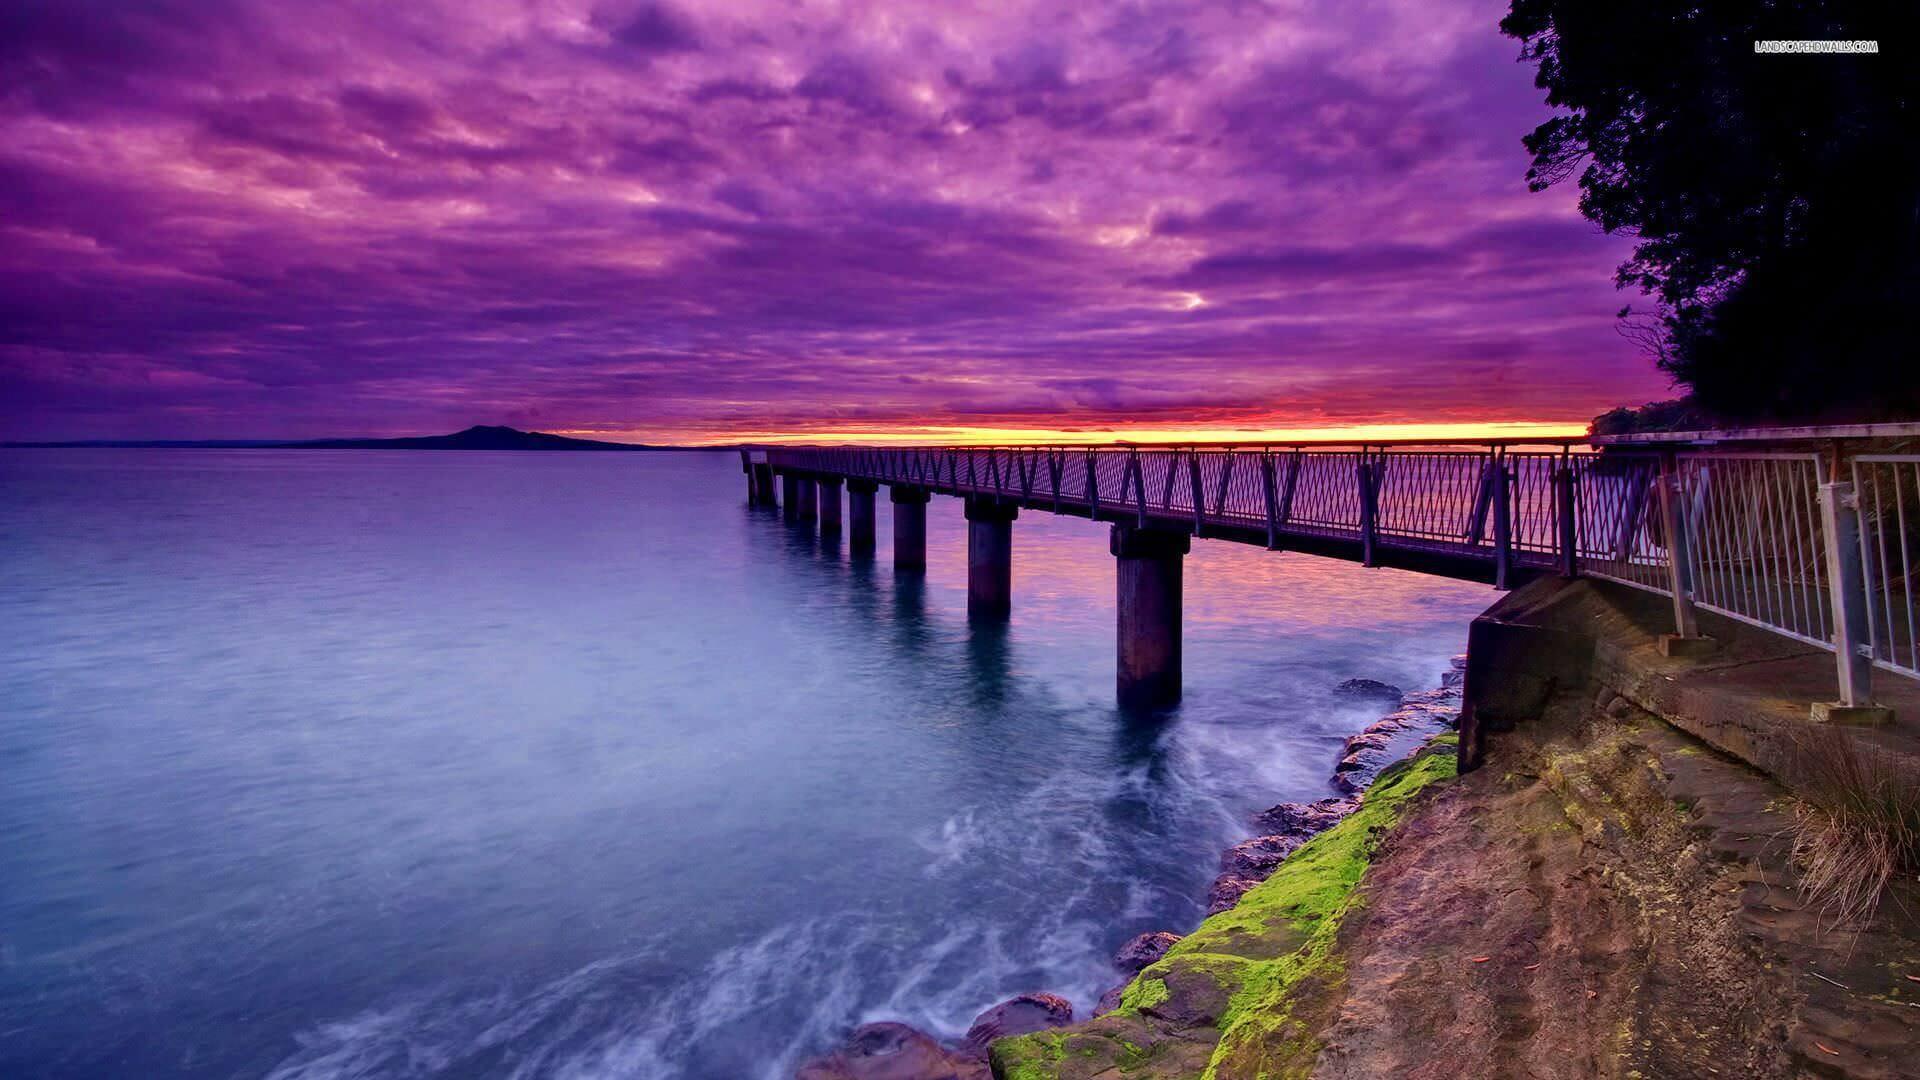 dawn-on-the-sea-5426-1920x1080